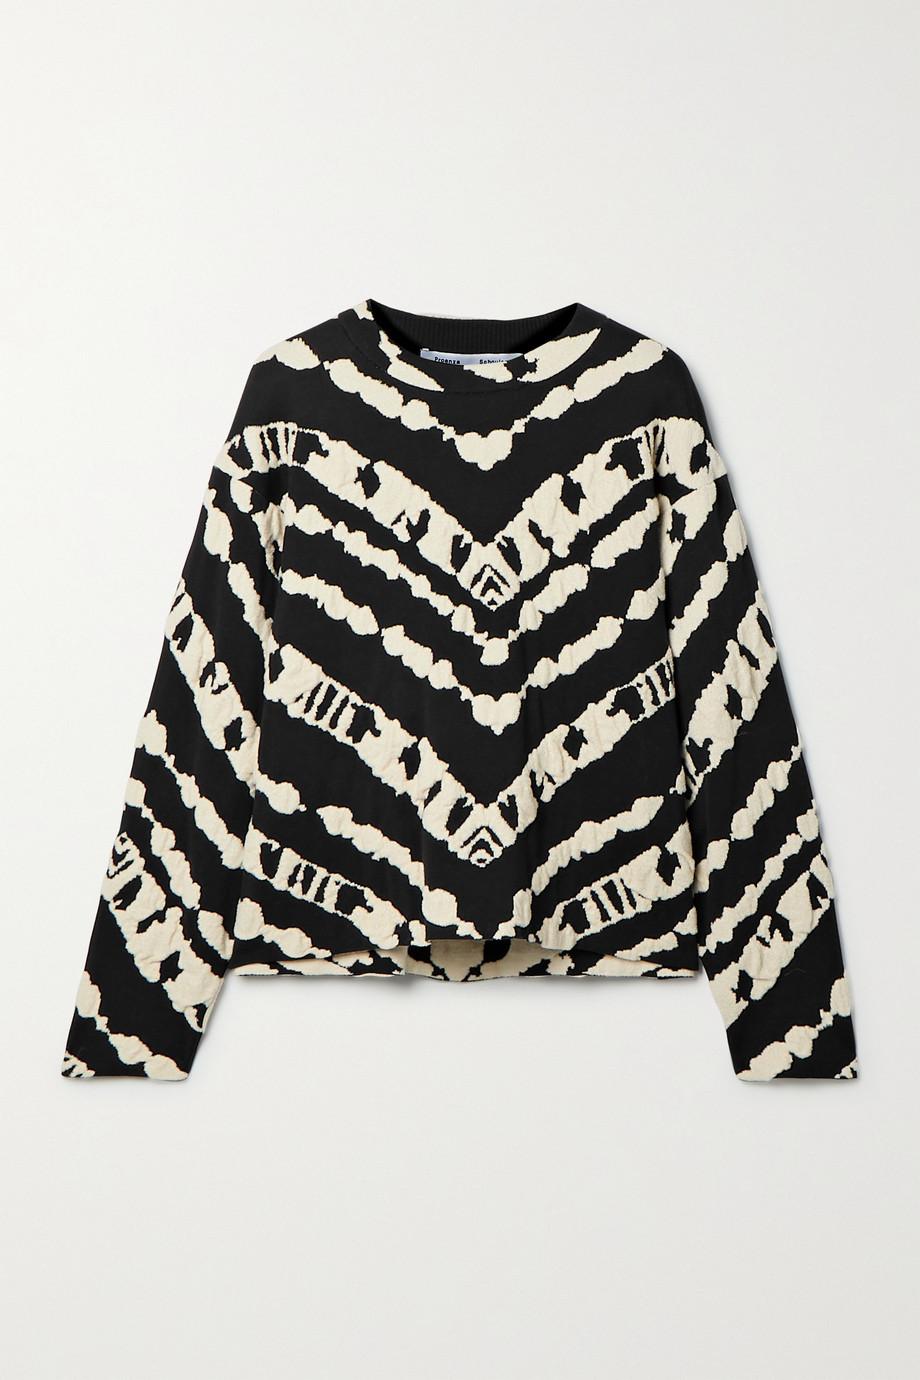 Proenza Schouler White Label Jacquard-knit top